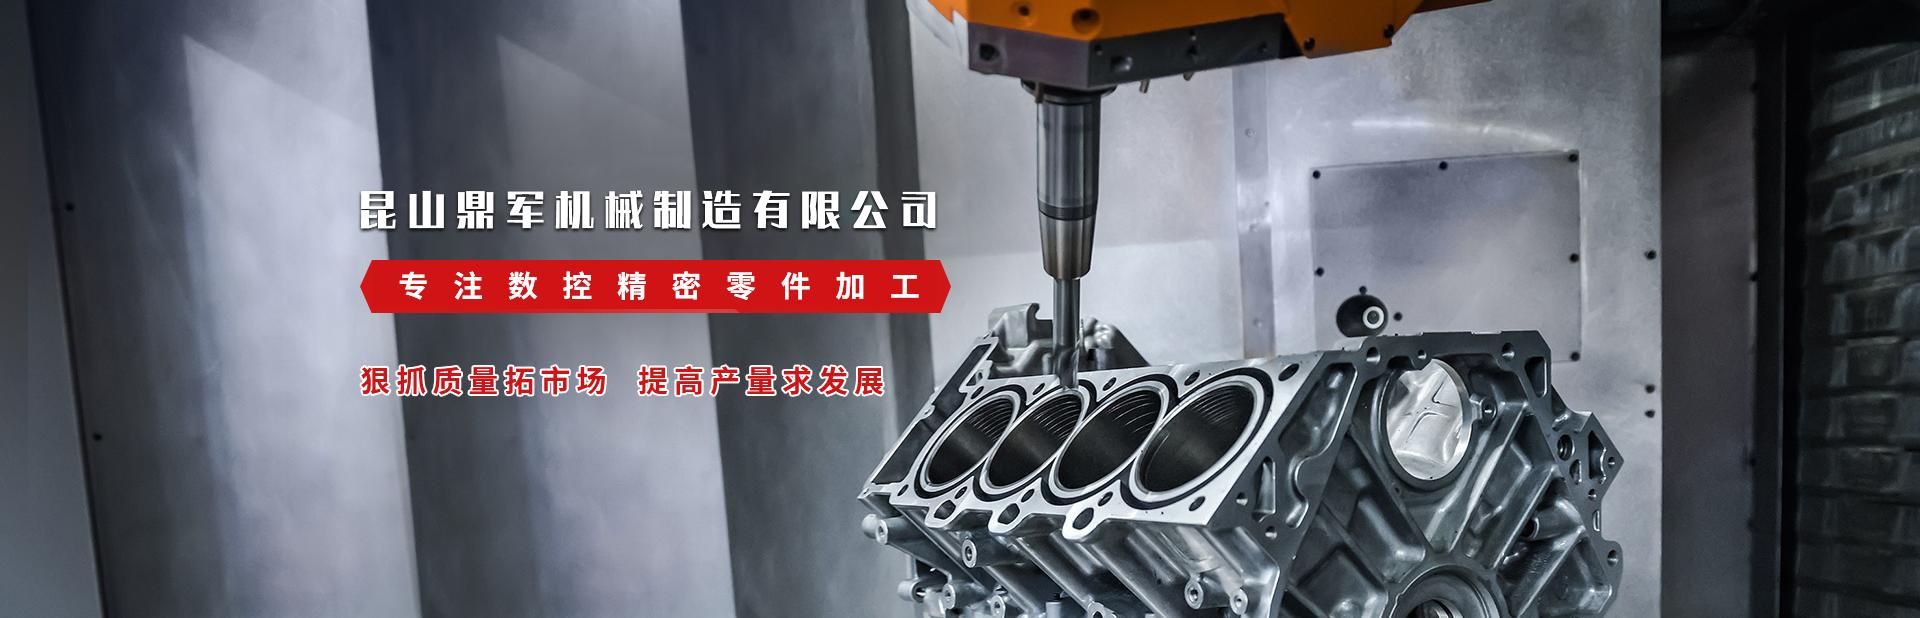 CNC热博rb88客户端厂家